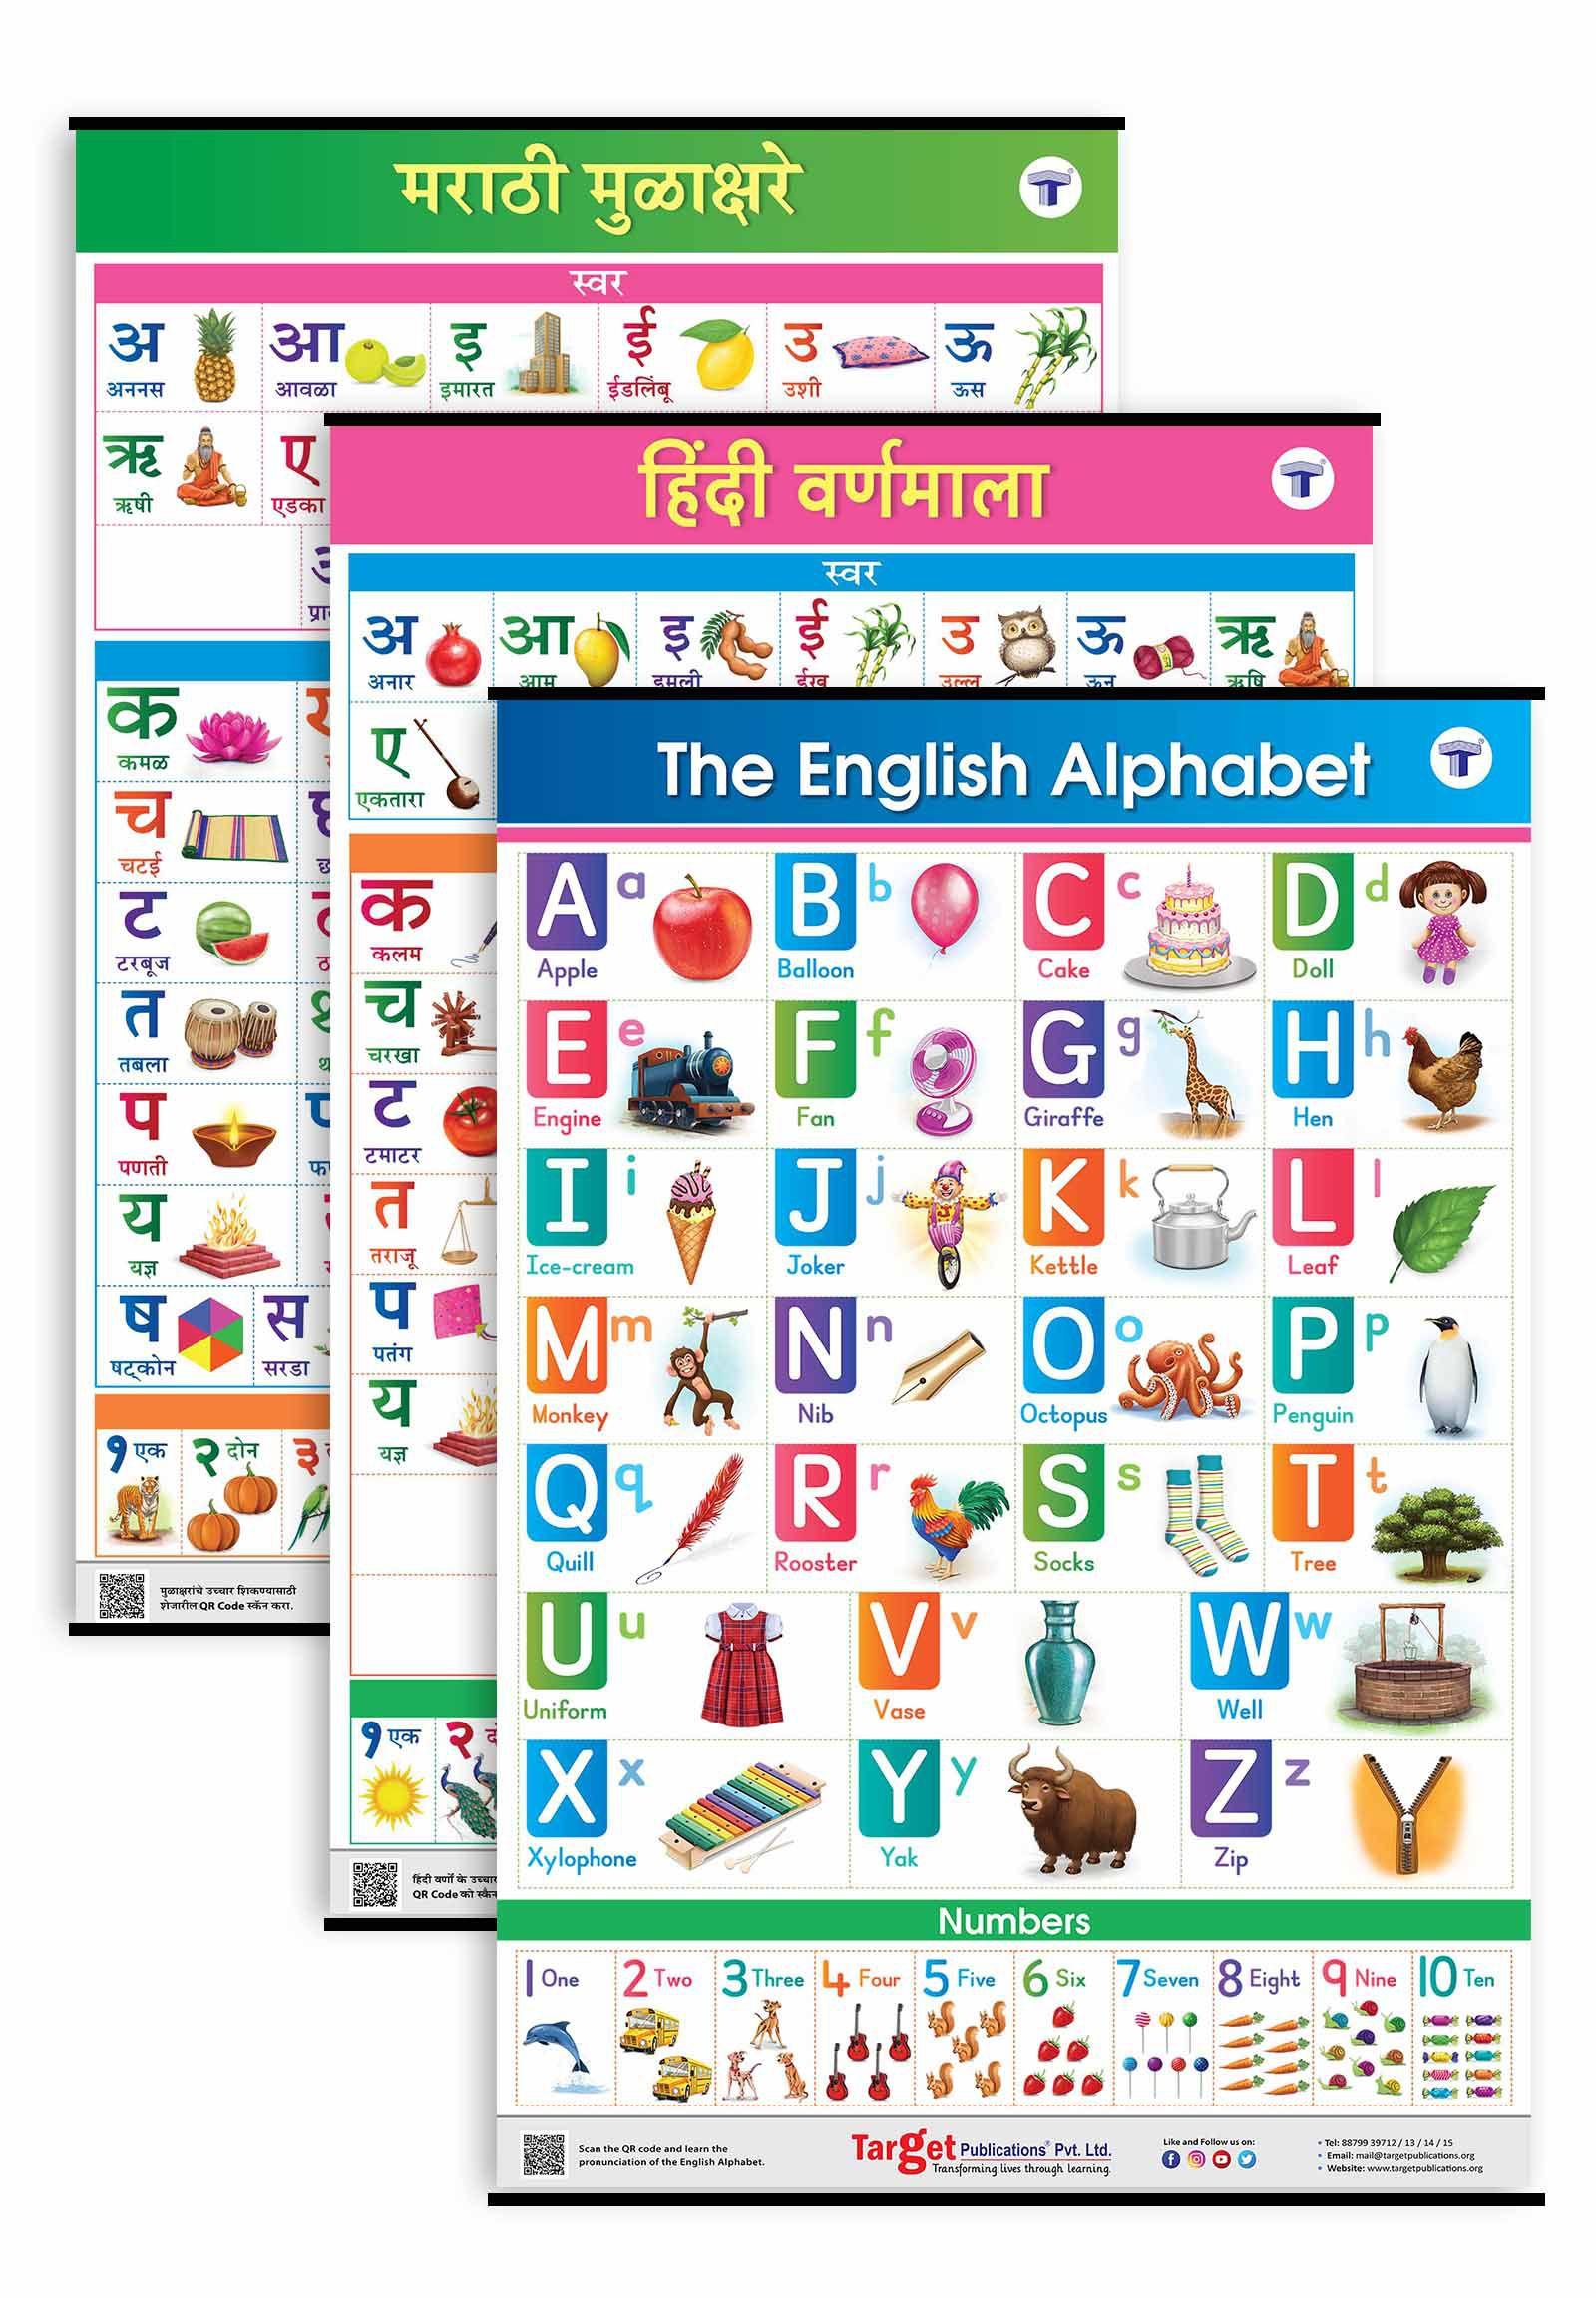 Jumbo English, Hindi and Marathi Alphabet and Number Charts for Kids (English Alphabet, Hindi Varnamala and Marathi Mulakshare - Set of 3 Charts) | Perfect For Homeschooling, Kindergarten and Nursery Children | (39.25 x 27.25 Inch)